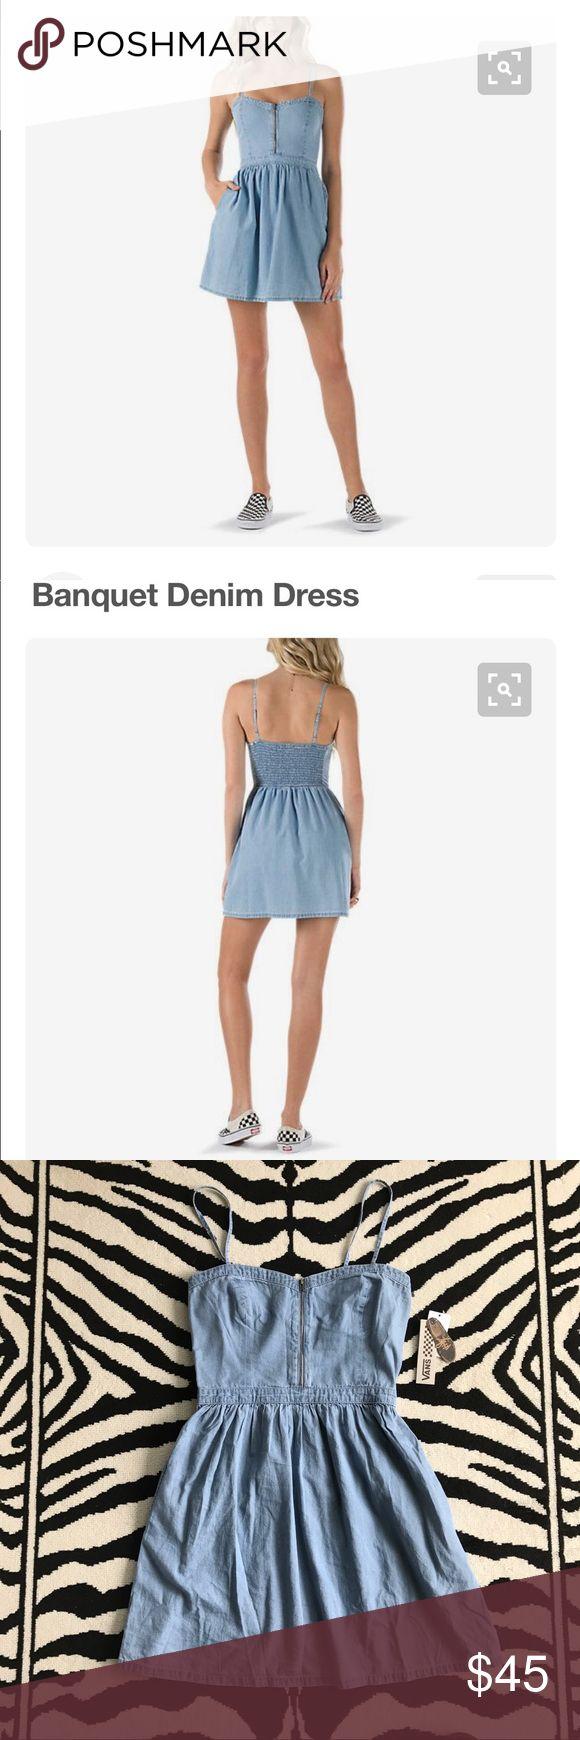 Festival • Denim Dress Vans Banquet Denim Dress. The Banquet dress is 100% cotton lightweight denim fit and flare dress with a front zipper, smocking at the back and side pockets. Color: Light Indigo Vans Dresses Mini